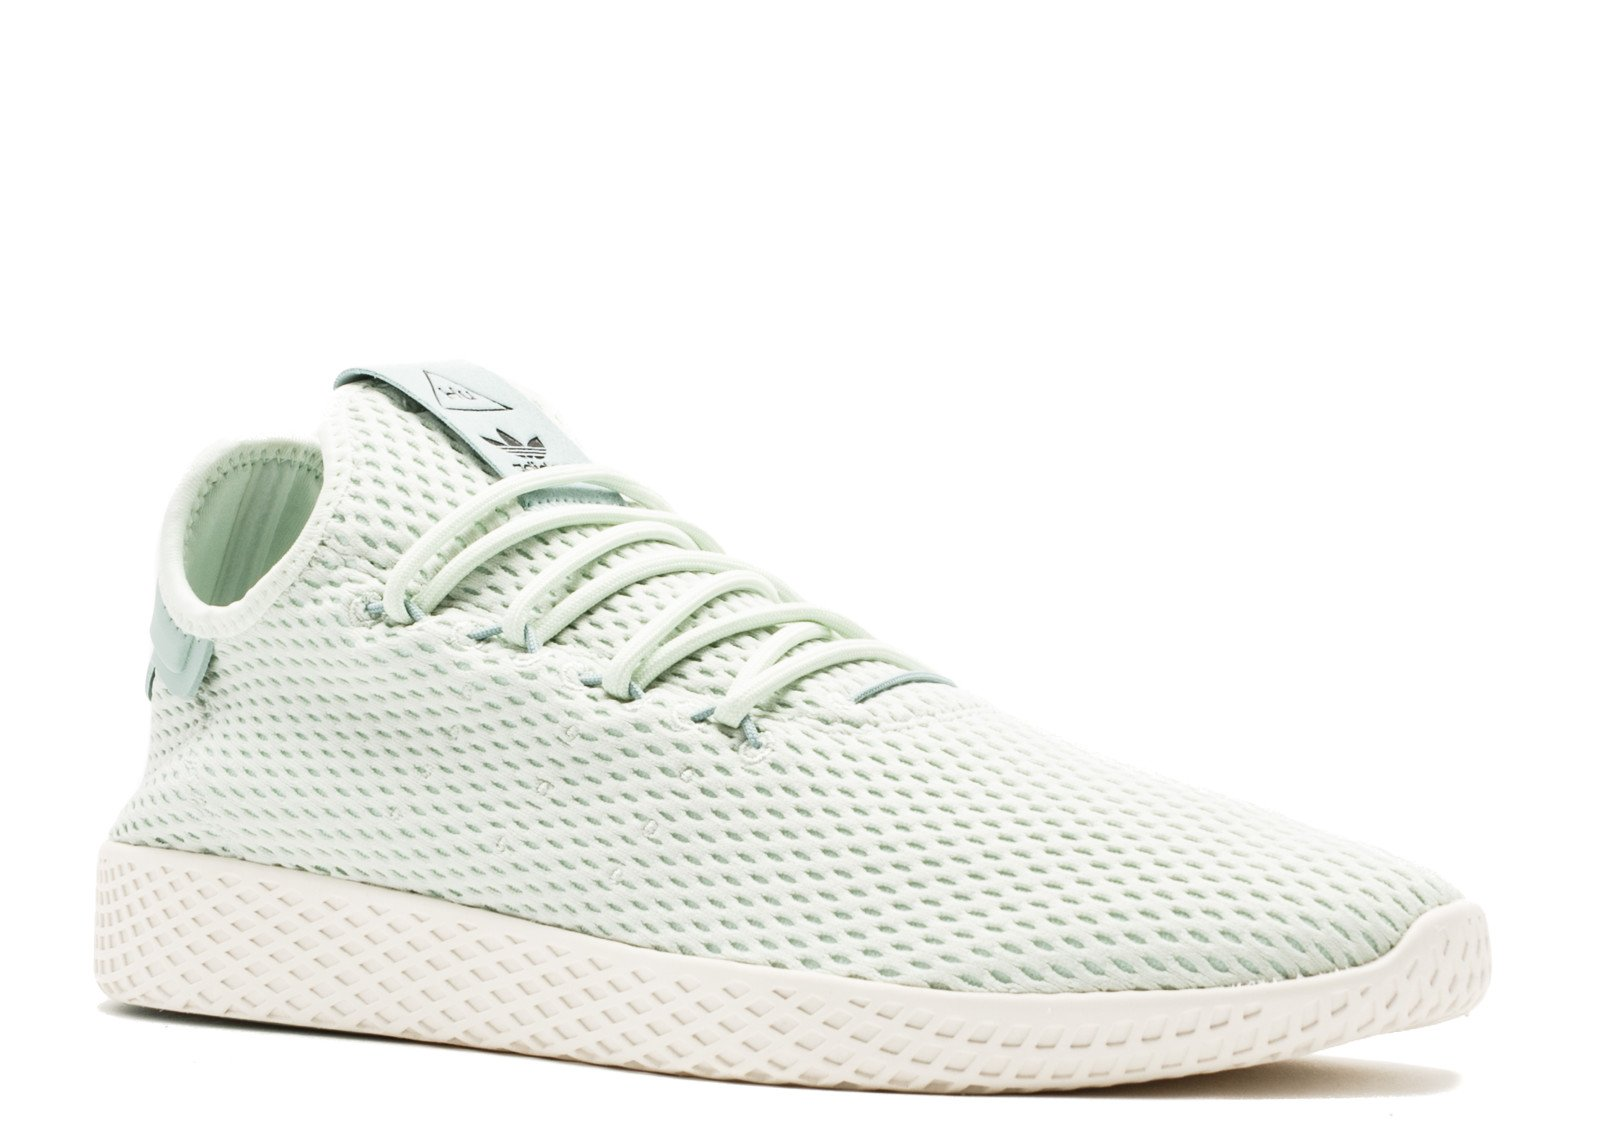 Mens adidas Pharrell Williams Tennis HU Athletic Shoe (9.5 D(M) US, Linen Green 6367)